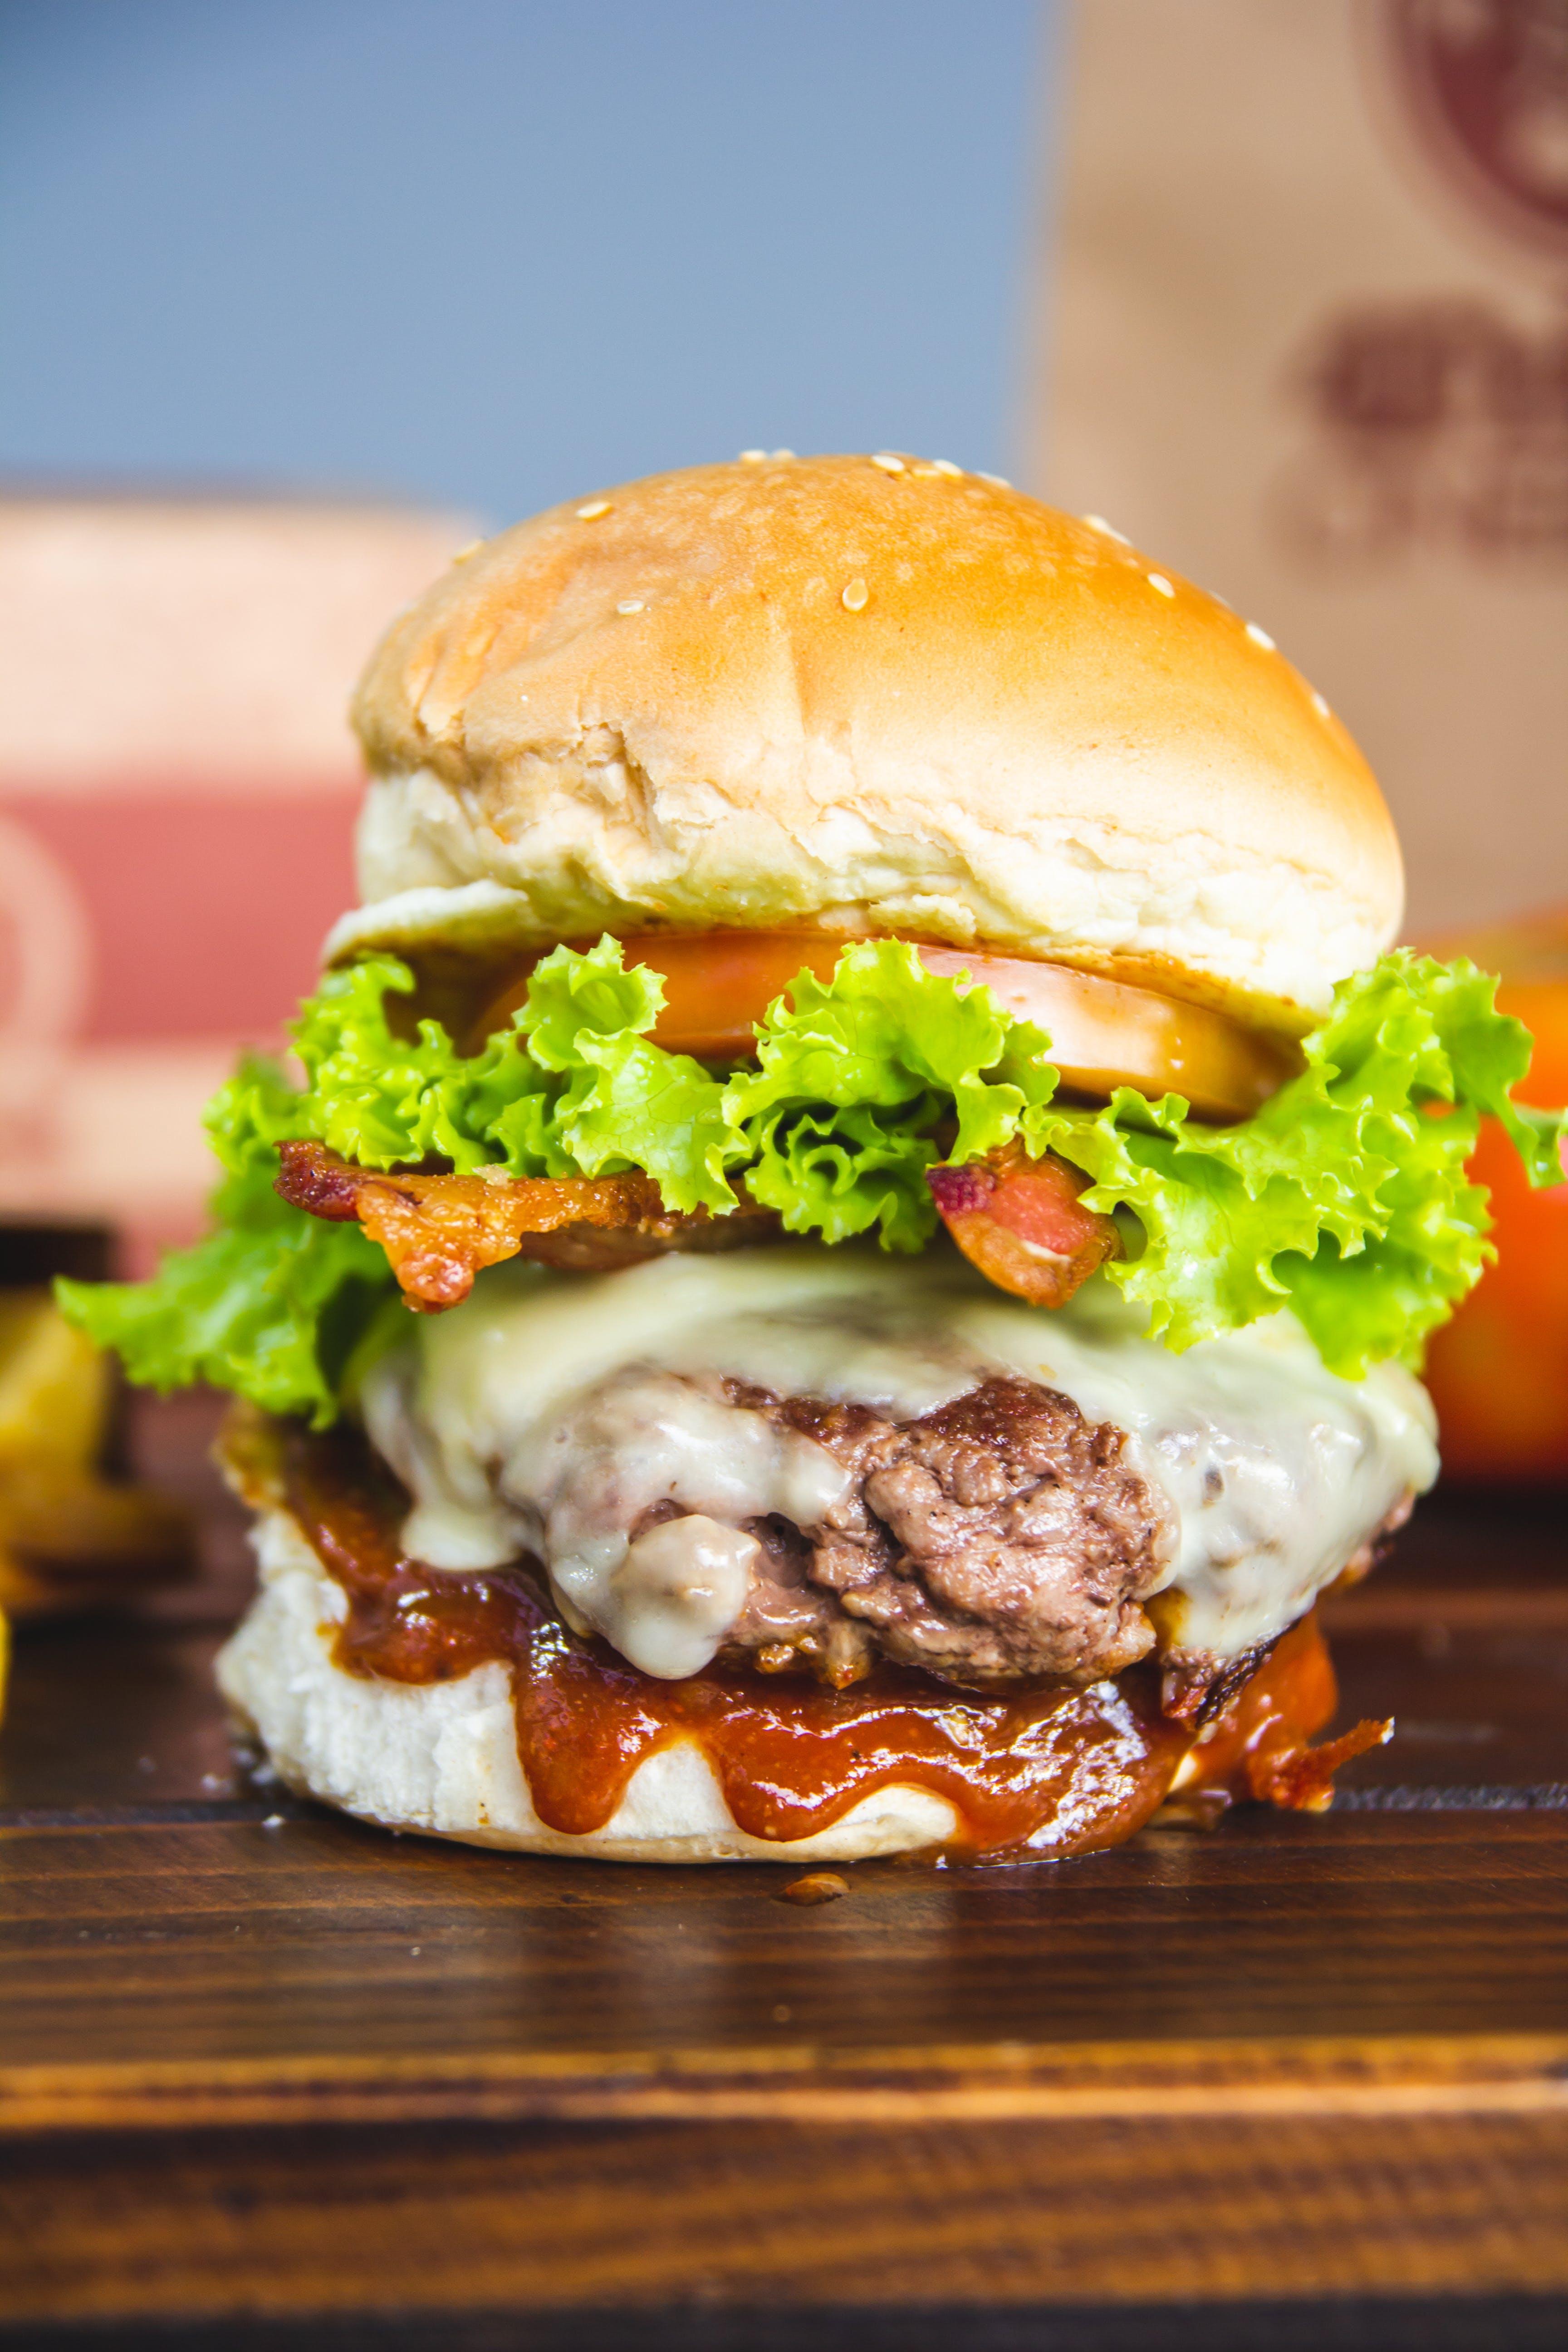 Fotos de stock gratuitas de apetecible, bollo, comida rápida, delicioso